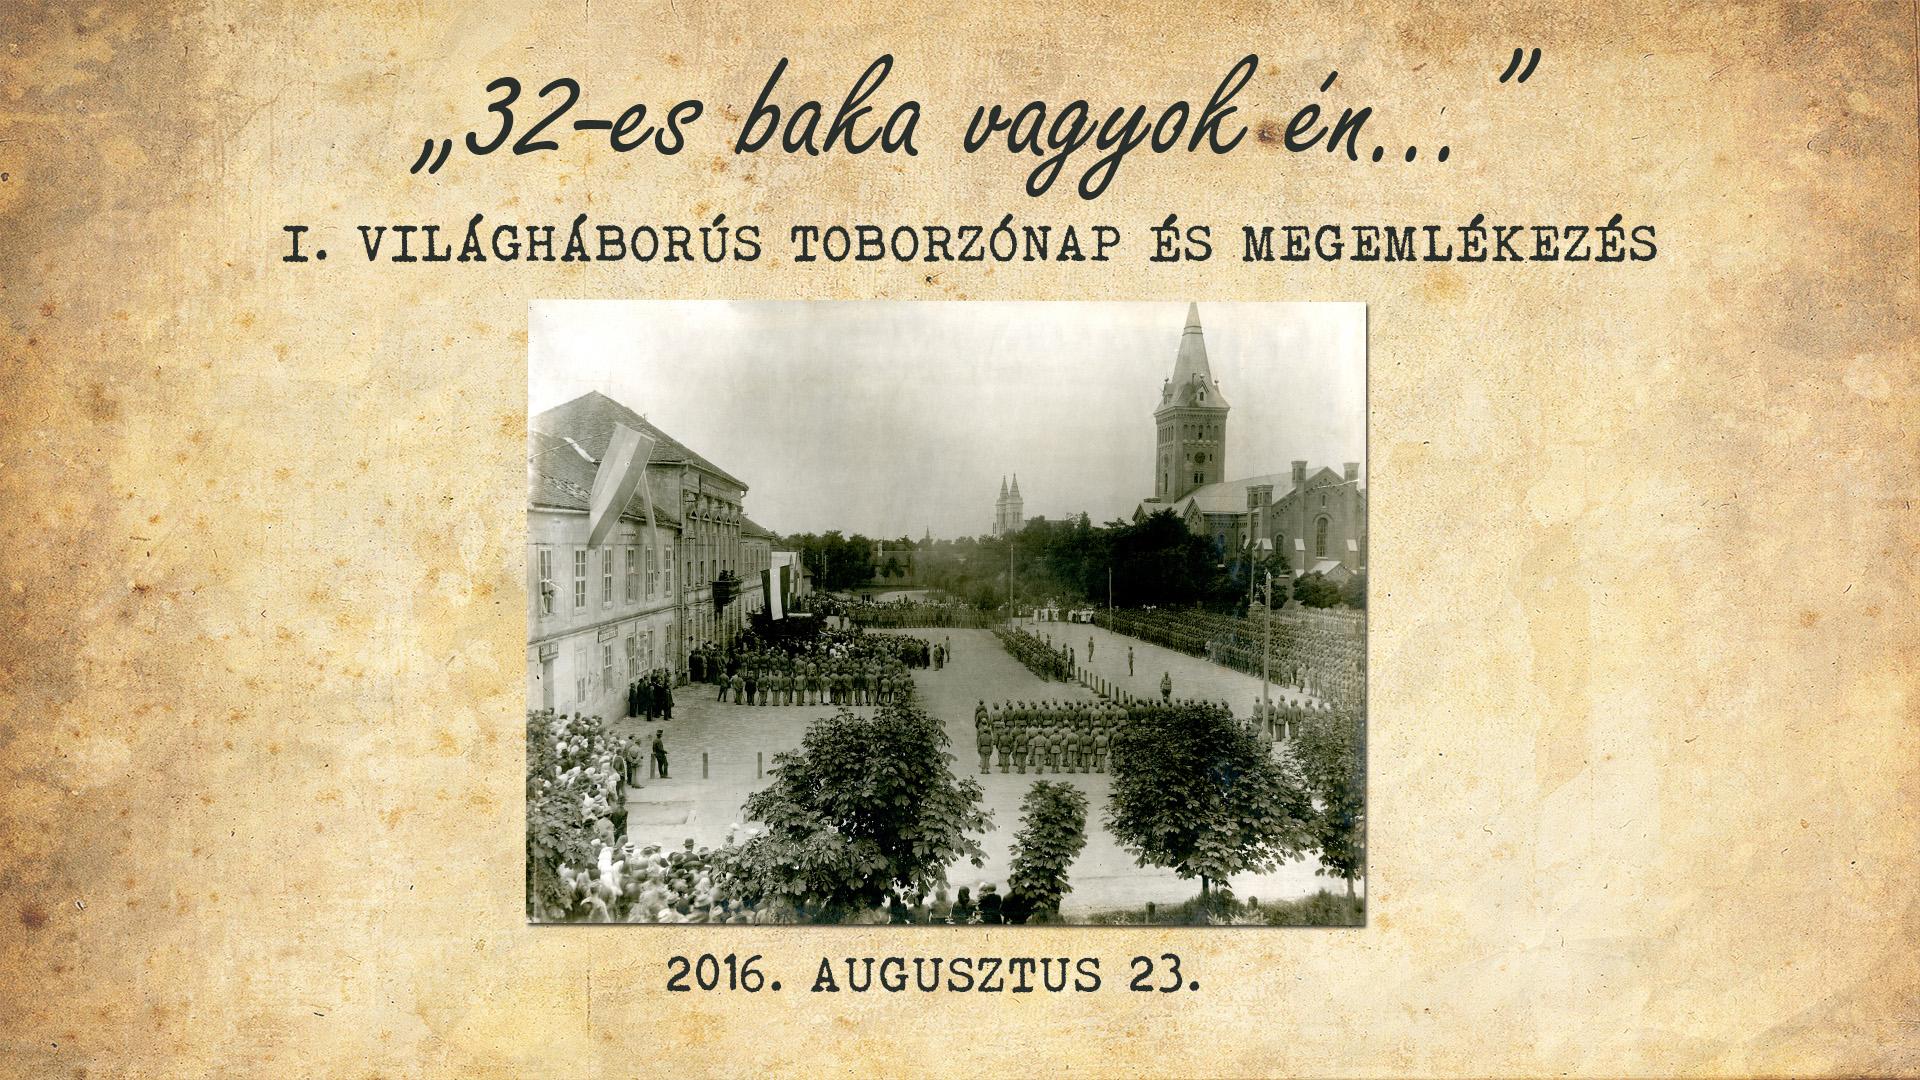 vilaghaboru_web